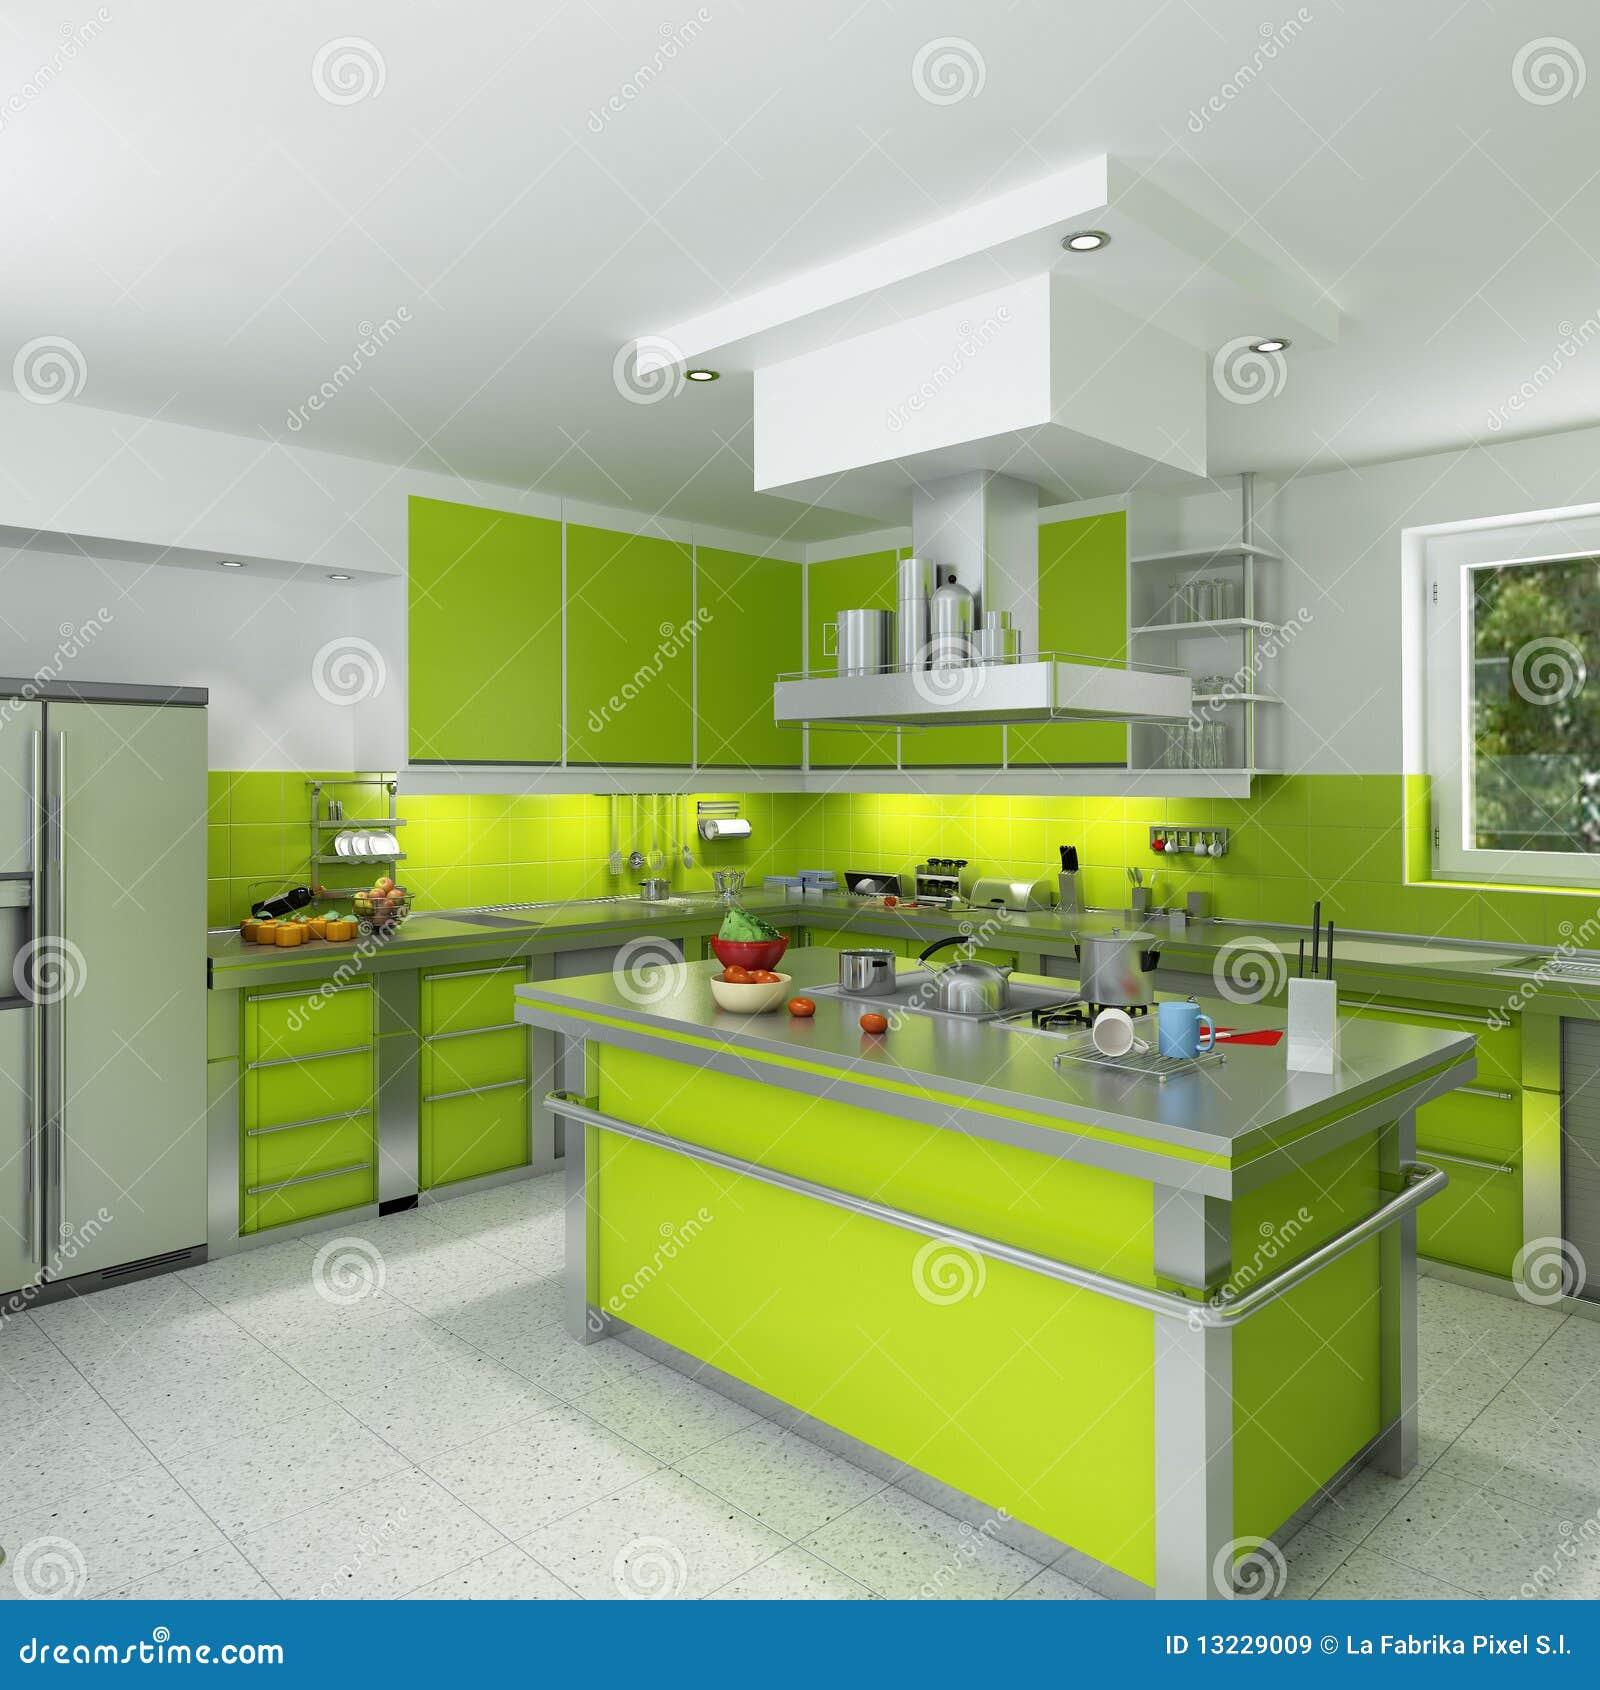 Grüne Küche moderne grüne küche lizenzfreie stockbilder bild 13229009